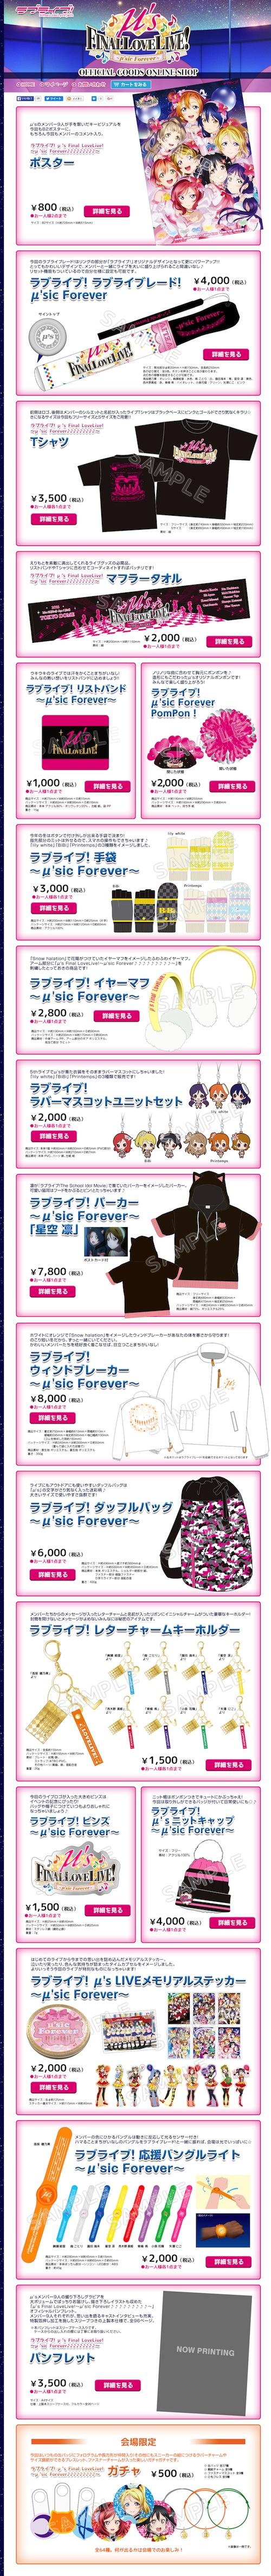 screencapture-fan-goods-jp-lovelive_6th-1449313151477